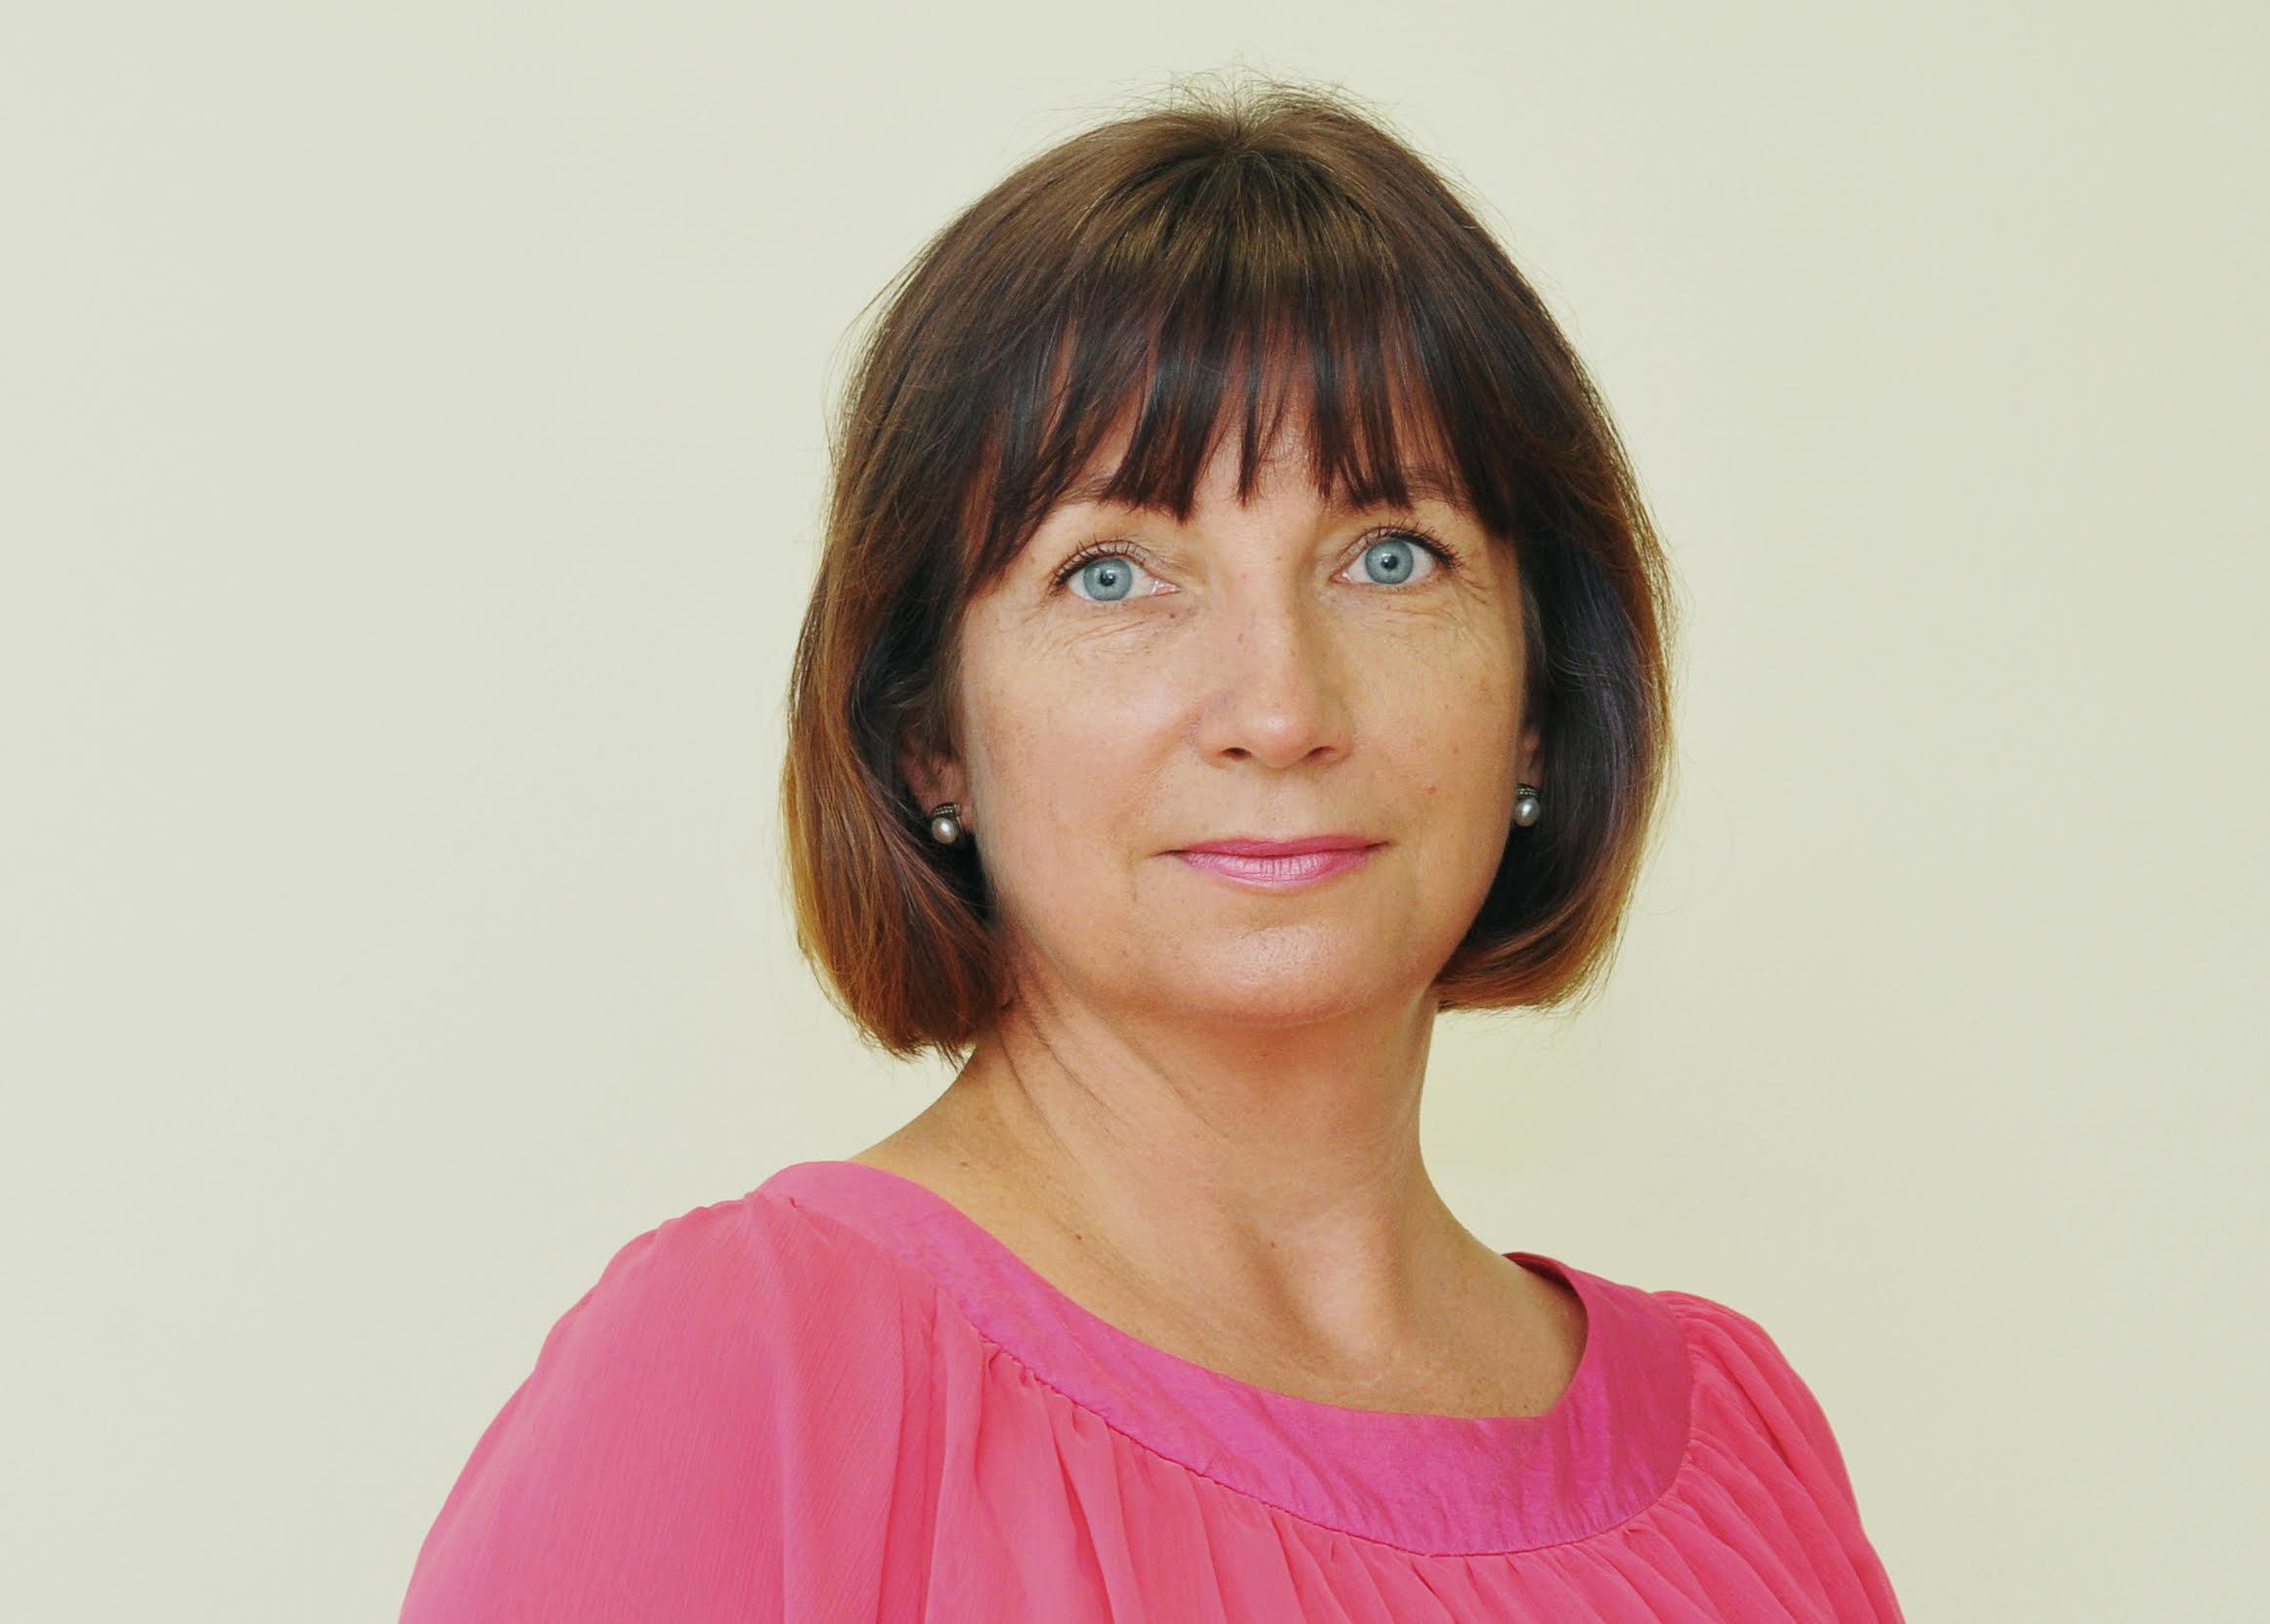 Picture of Helene Savolainen